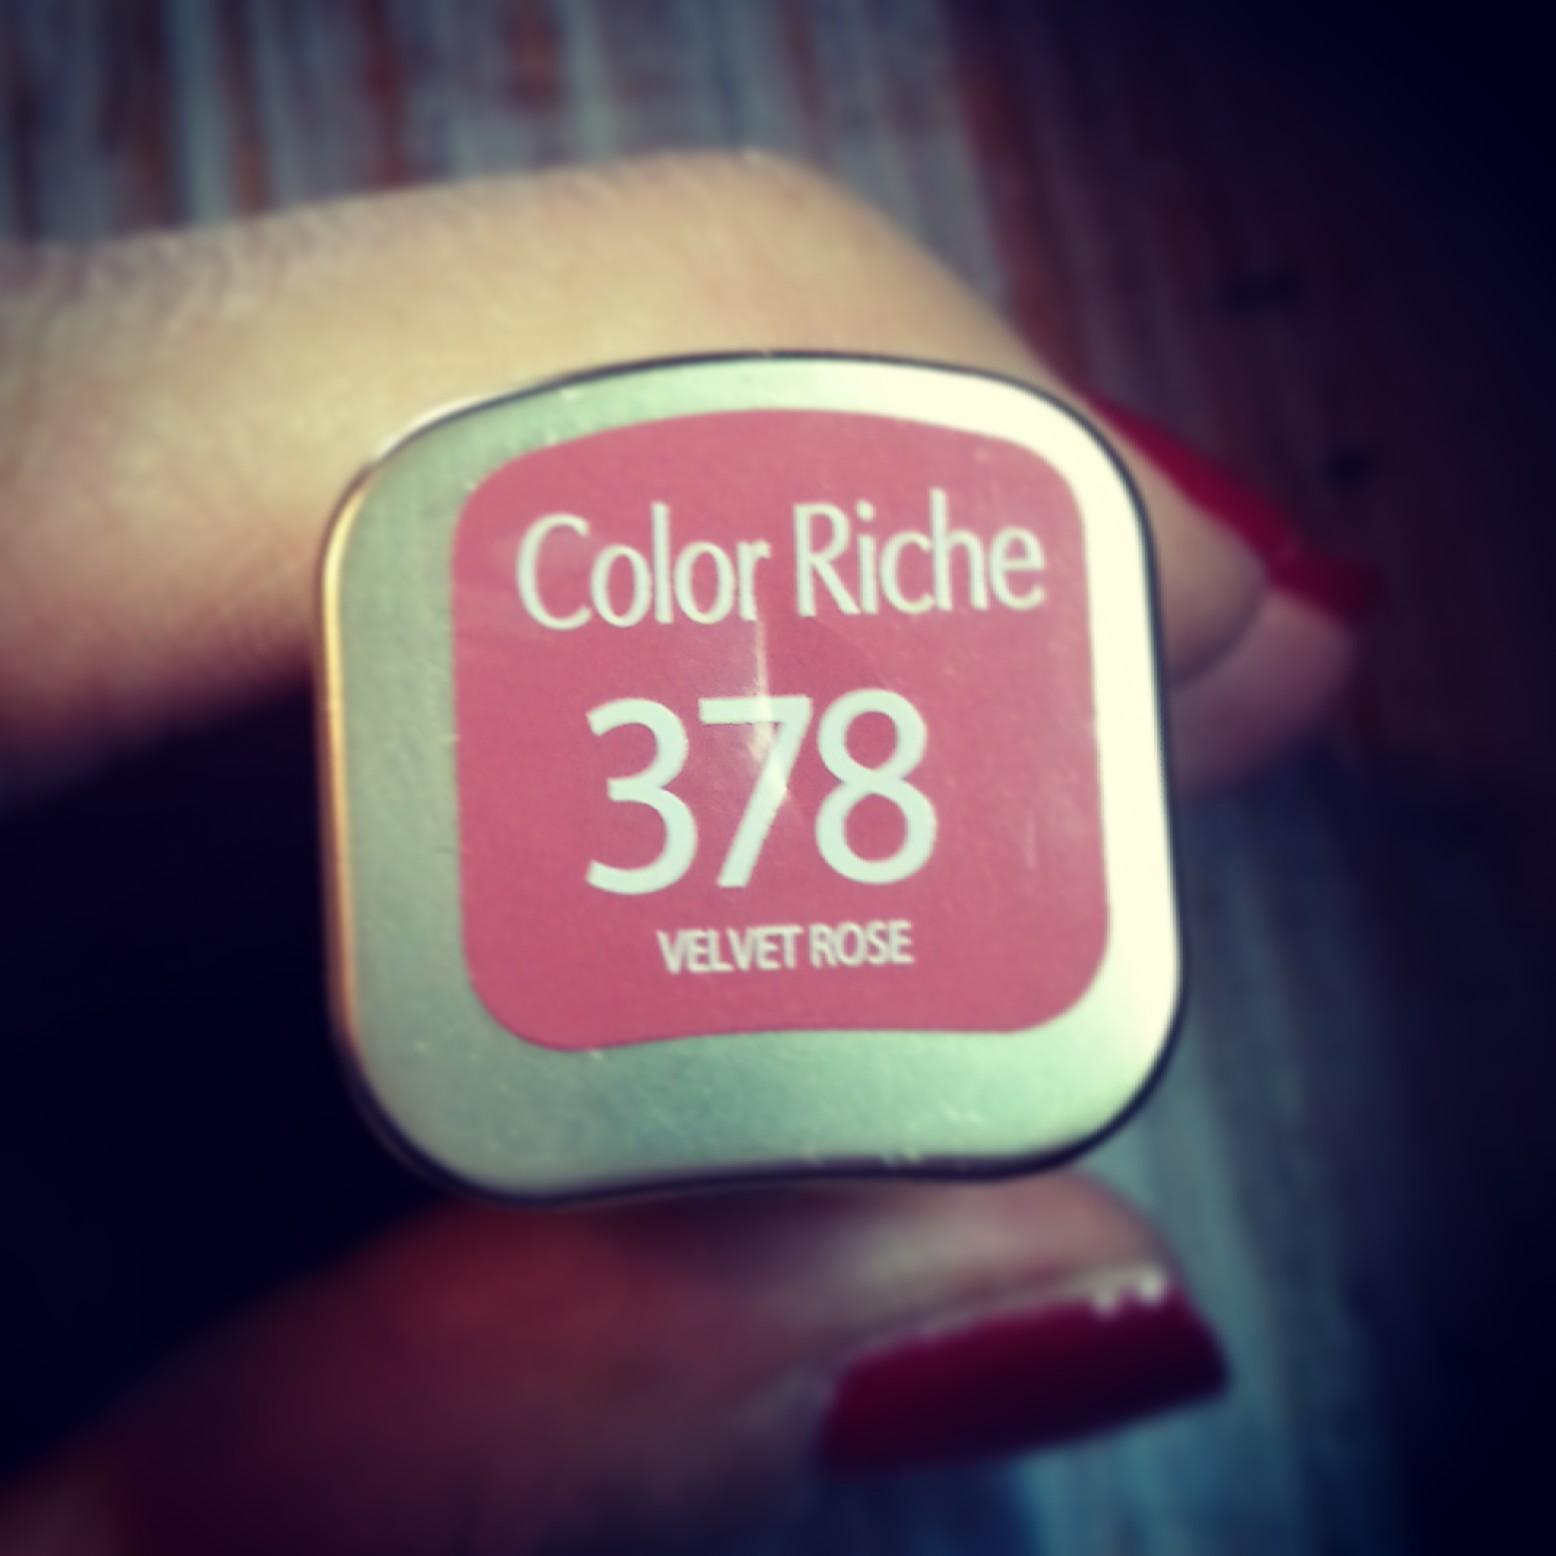 L'Oreal Color Riche 378 Velvet Rose